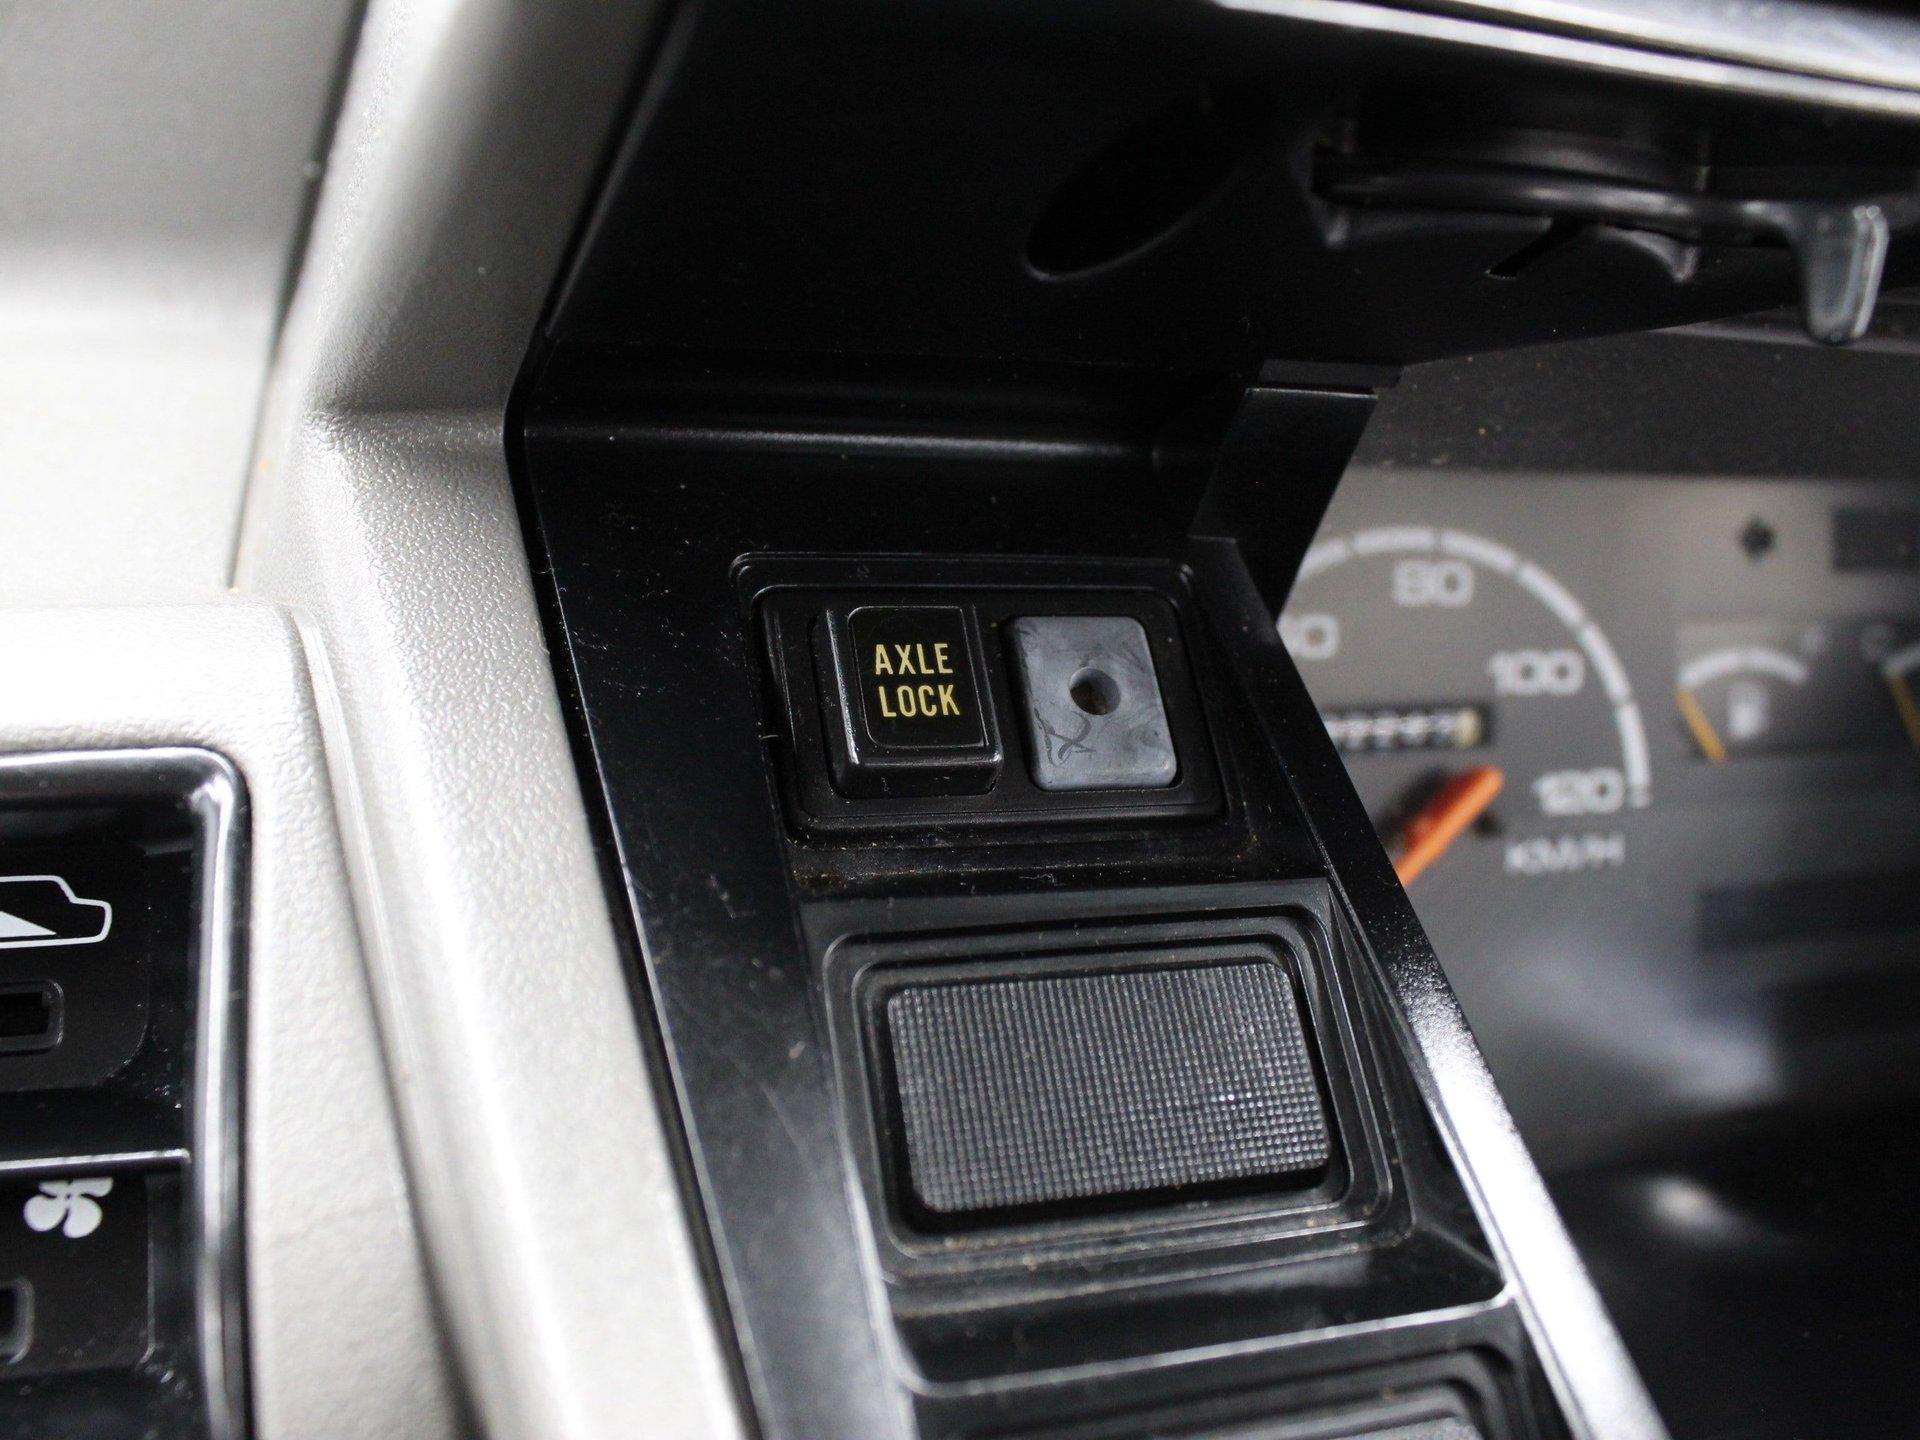 1990 Suzuki Carry